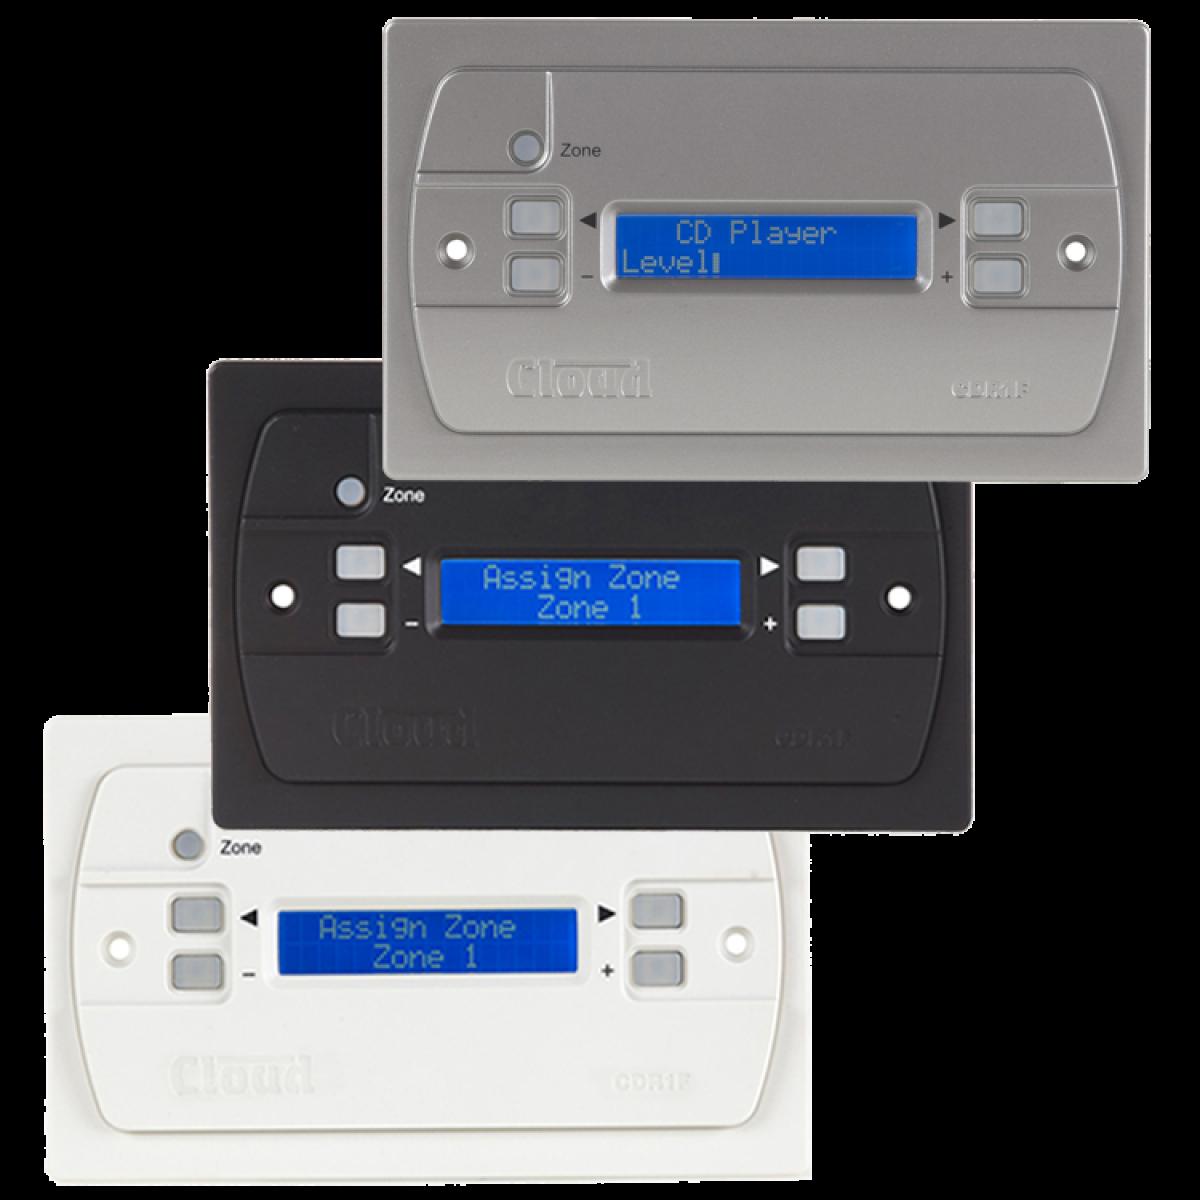 CDR-1FW & CDR-1FB & CDR-1FS Flush Mount Remote for DCM-1 / DCM1e